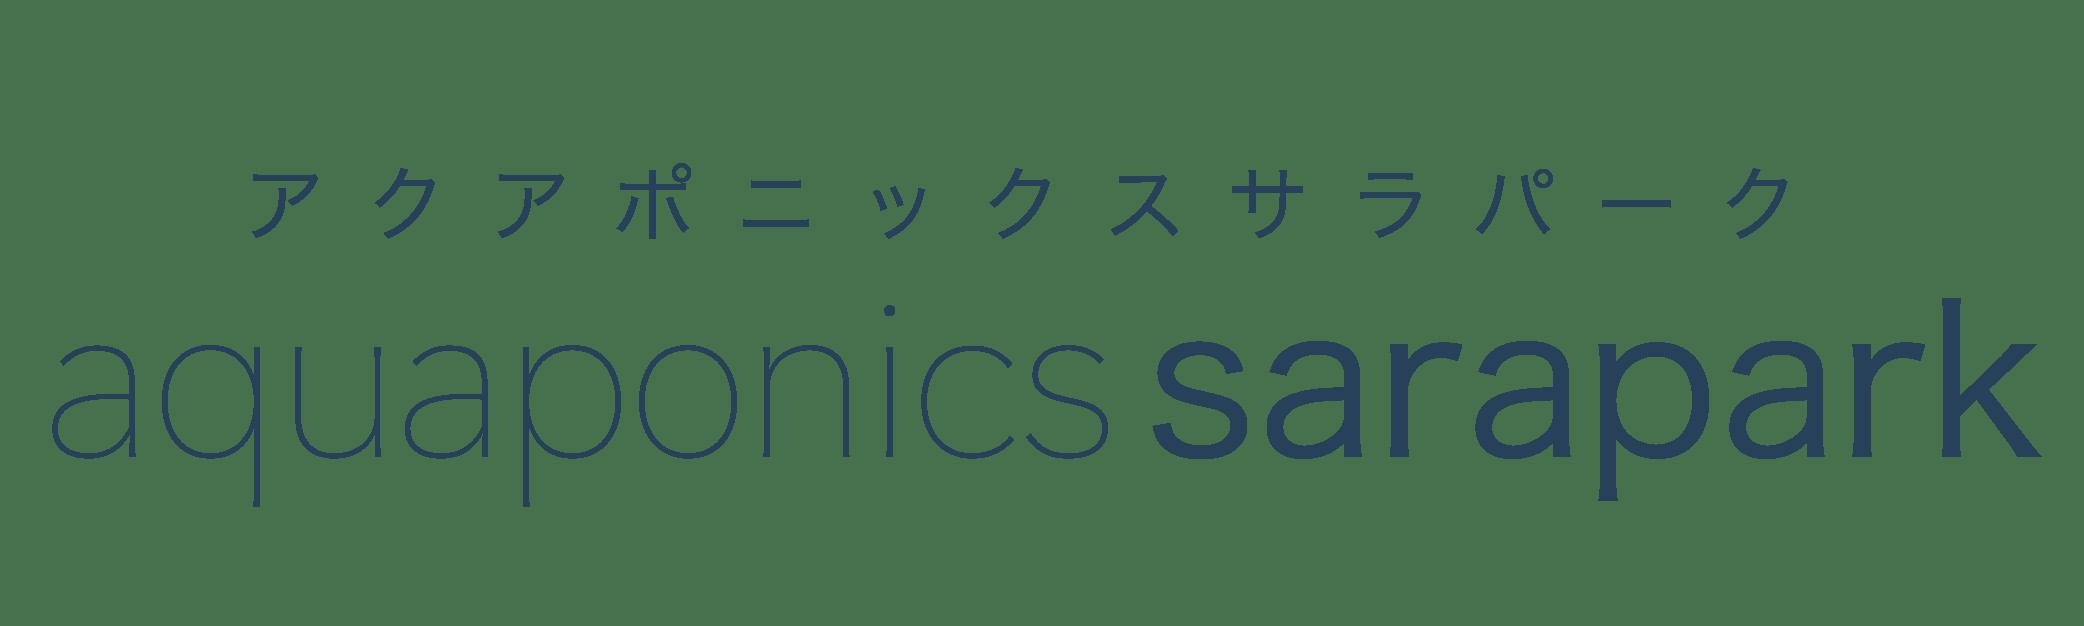 aquaponics sarapark(アクアポニックスサラパーク)                 </a>